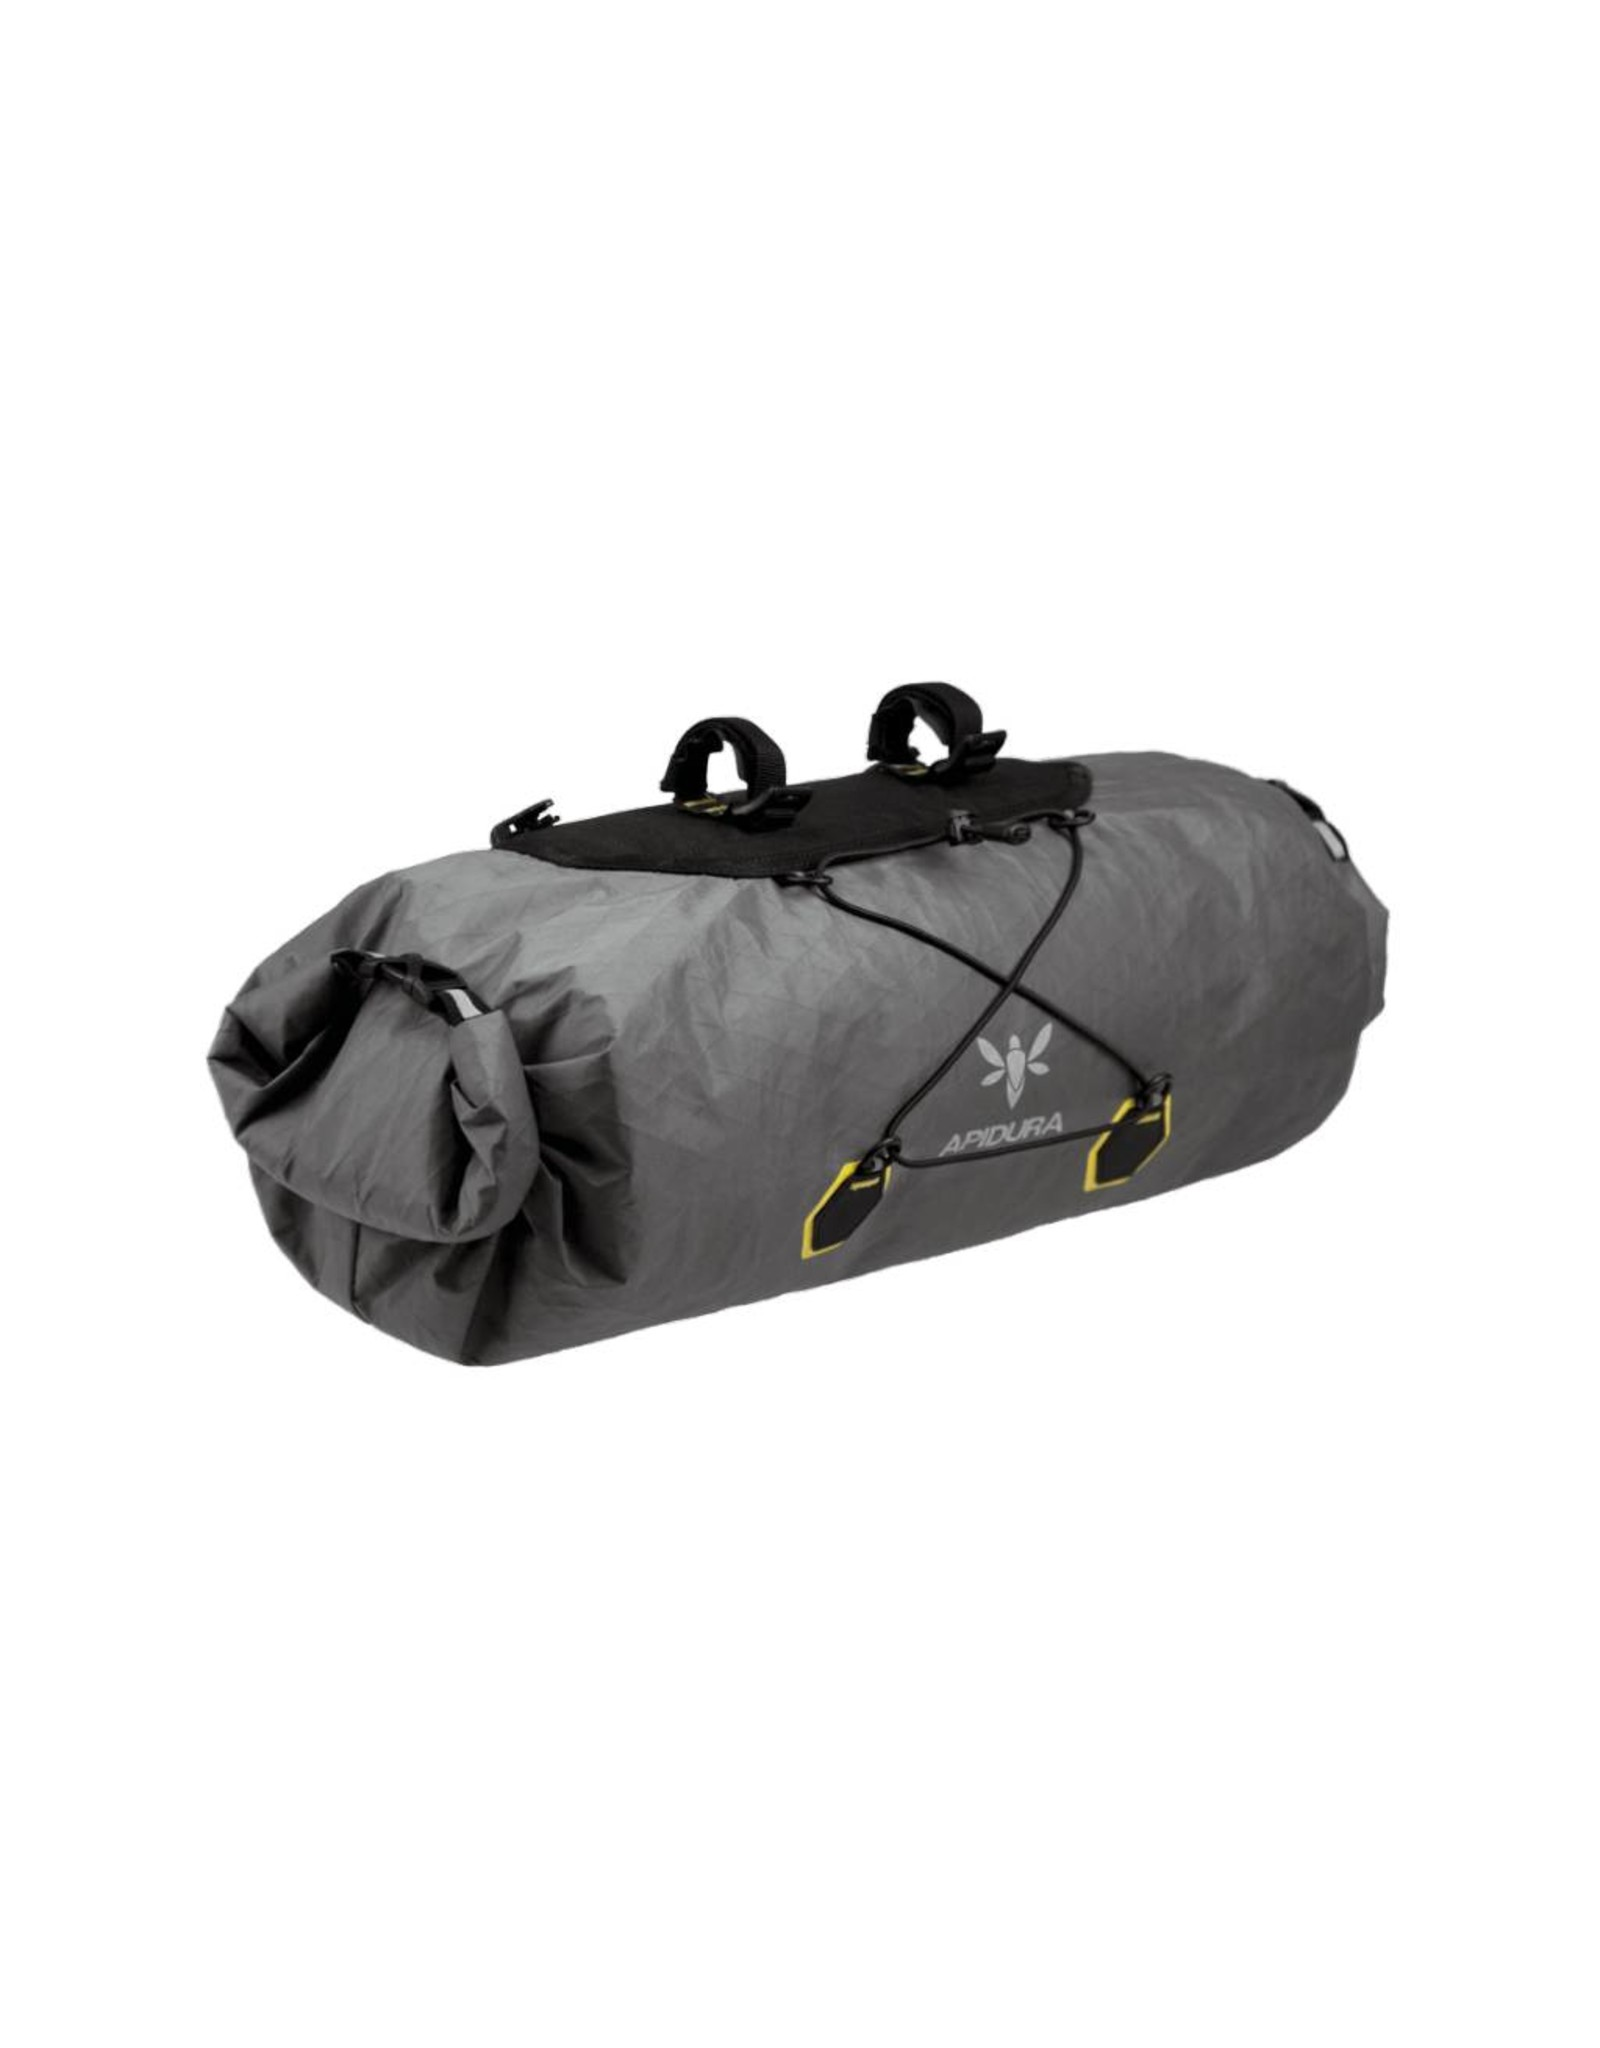 Apidura Apidura Front Handlebar Pack, Regular size 20 litre (cycle touring/bikepacking bag)